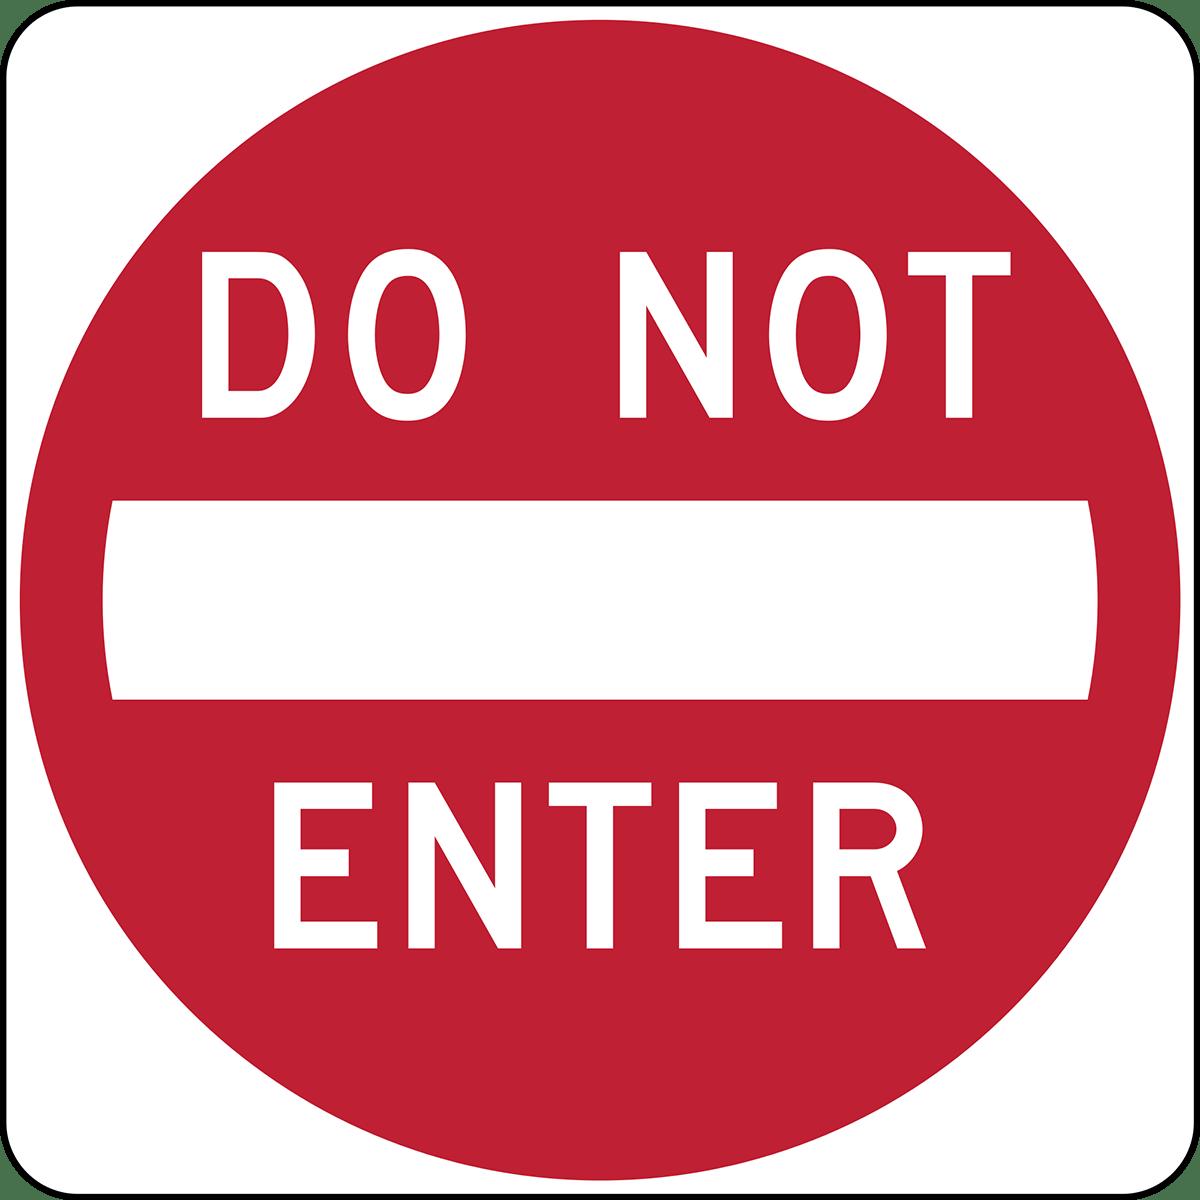 image relating to No Guns Allowed Sign Printable identified as Basic safety Indicators OSHA Basic safety Manuals